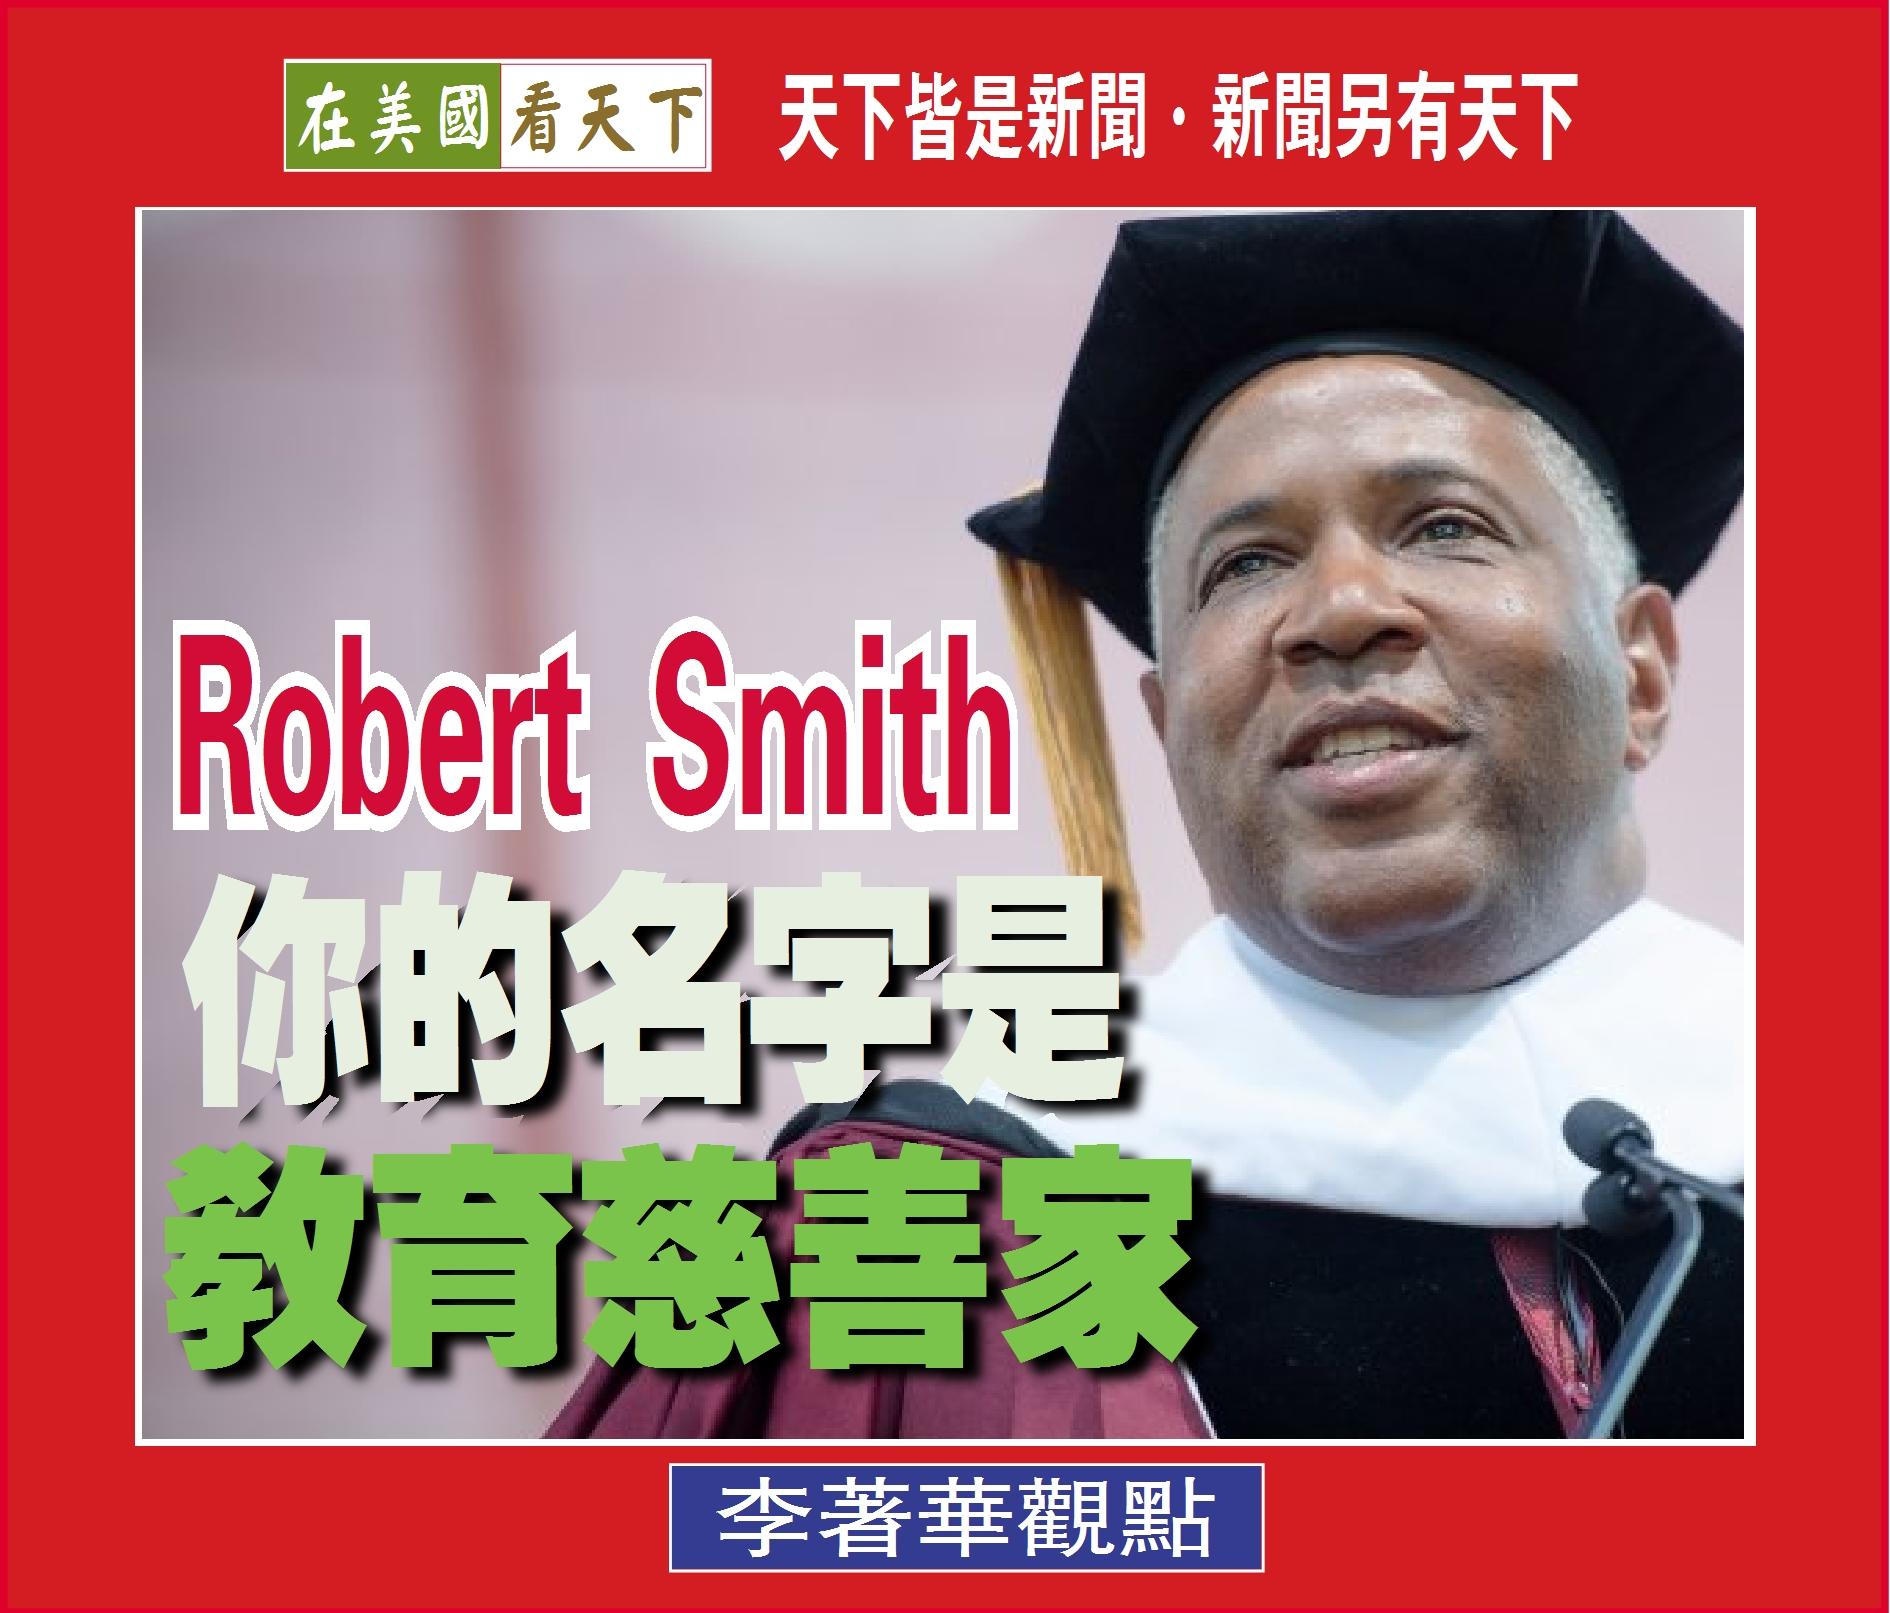 052119-Robert Smith的名字是教育慈善家-1